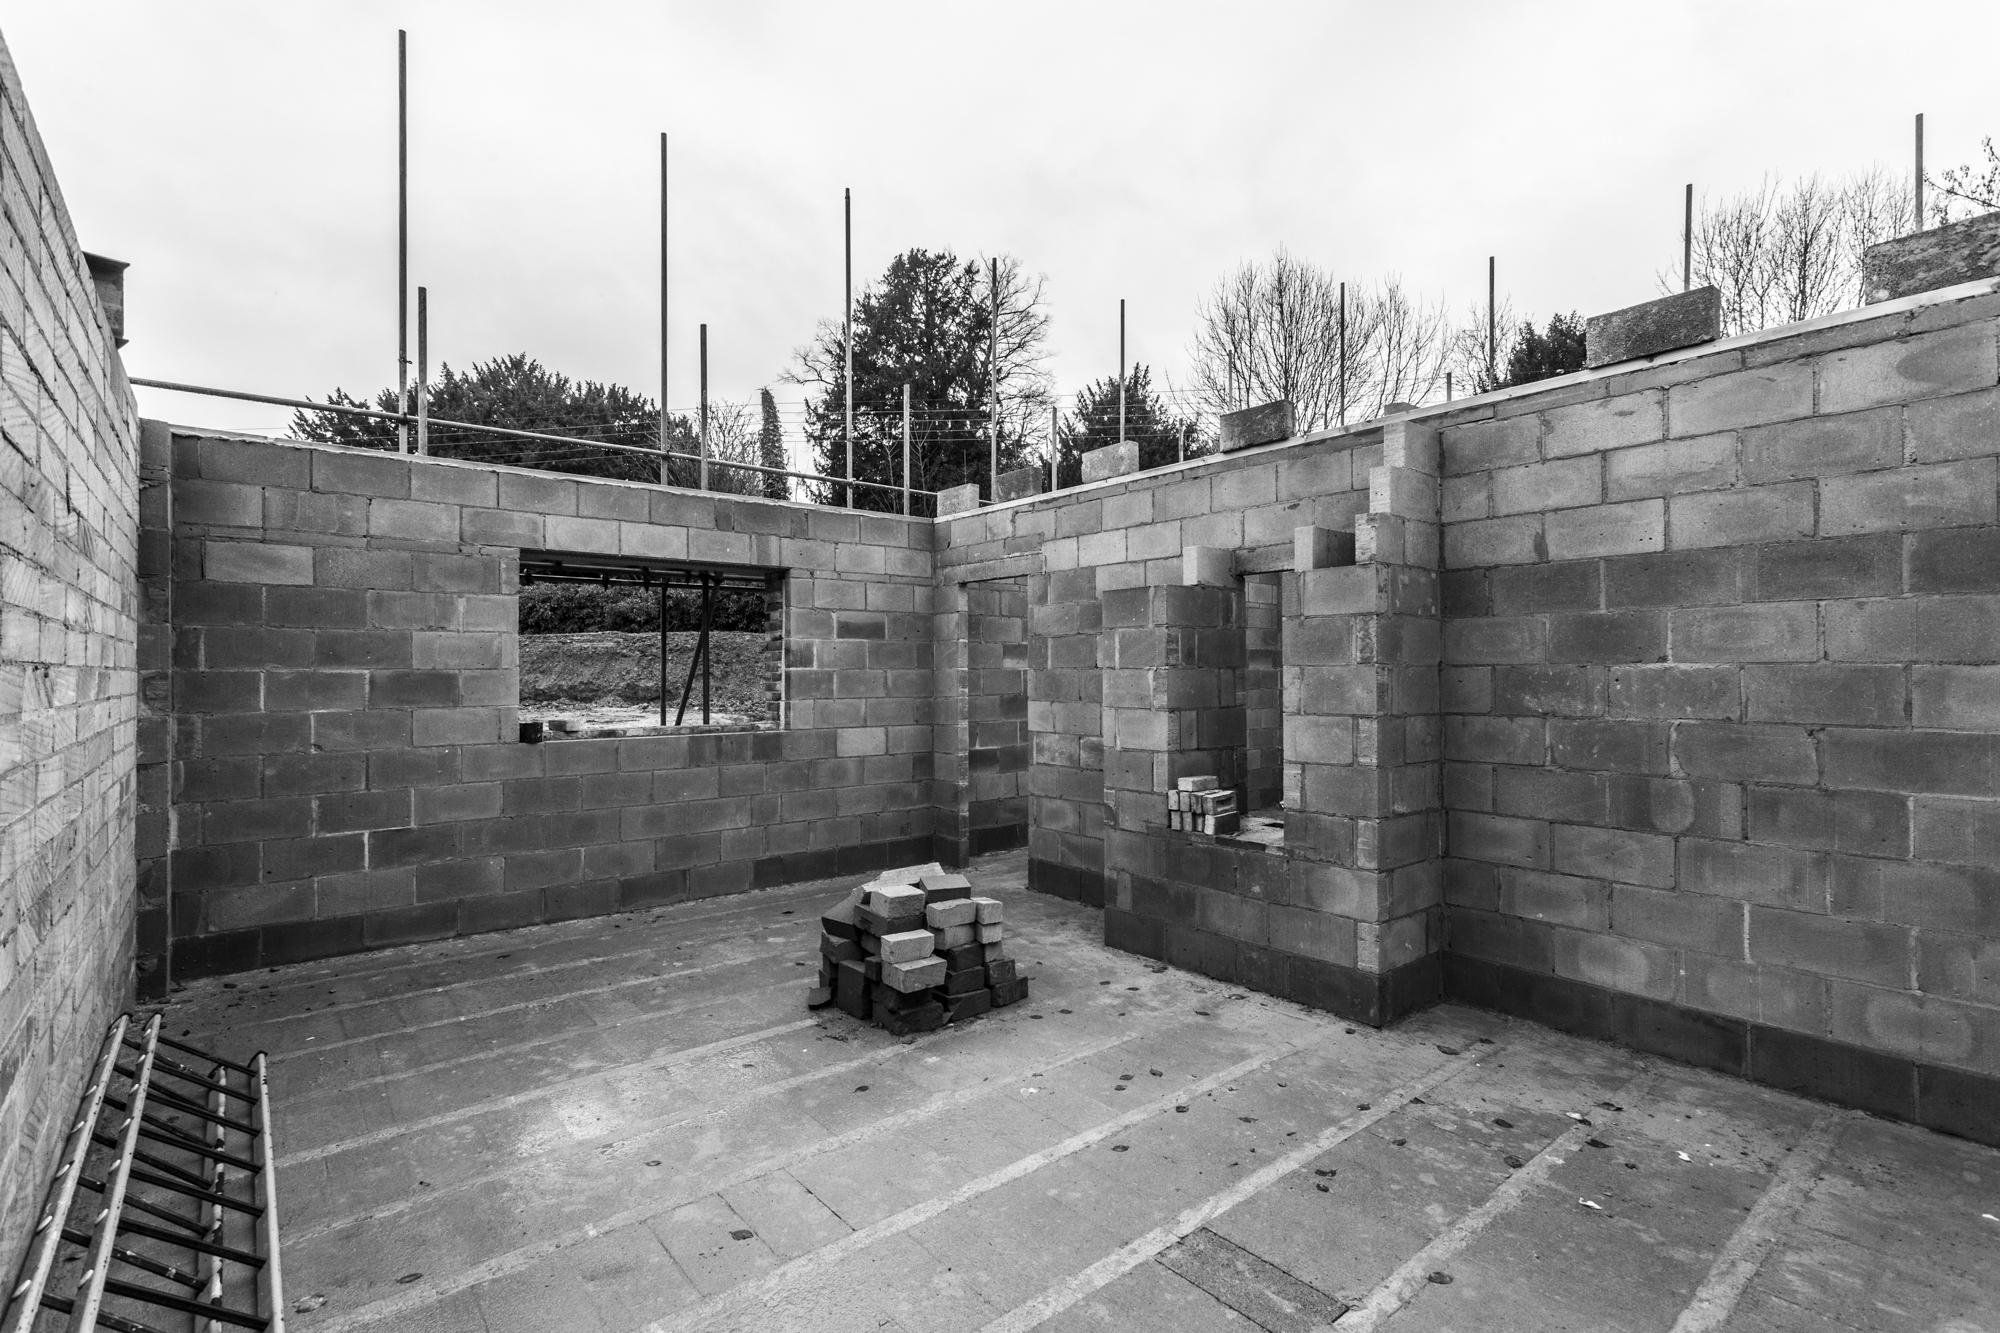 FlinthurstHouse_Construction_13.jpg